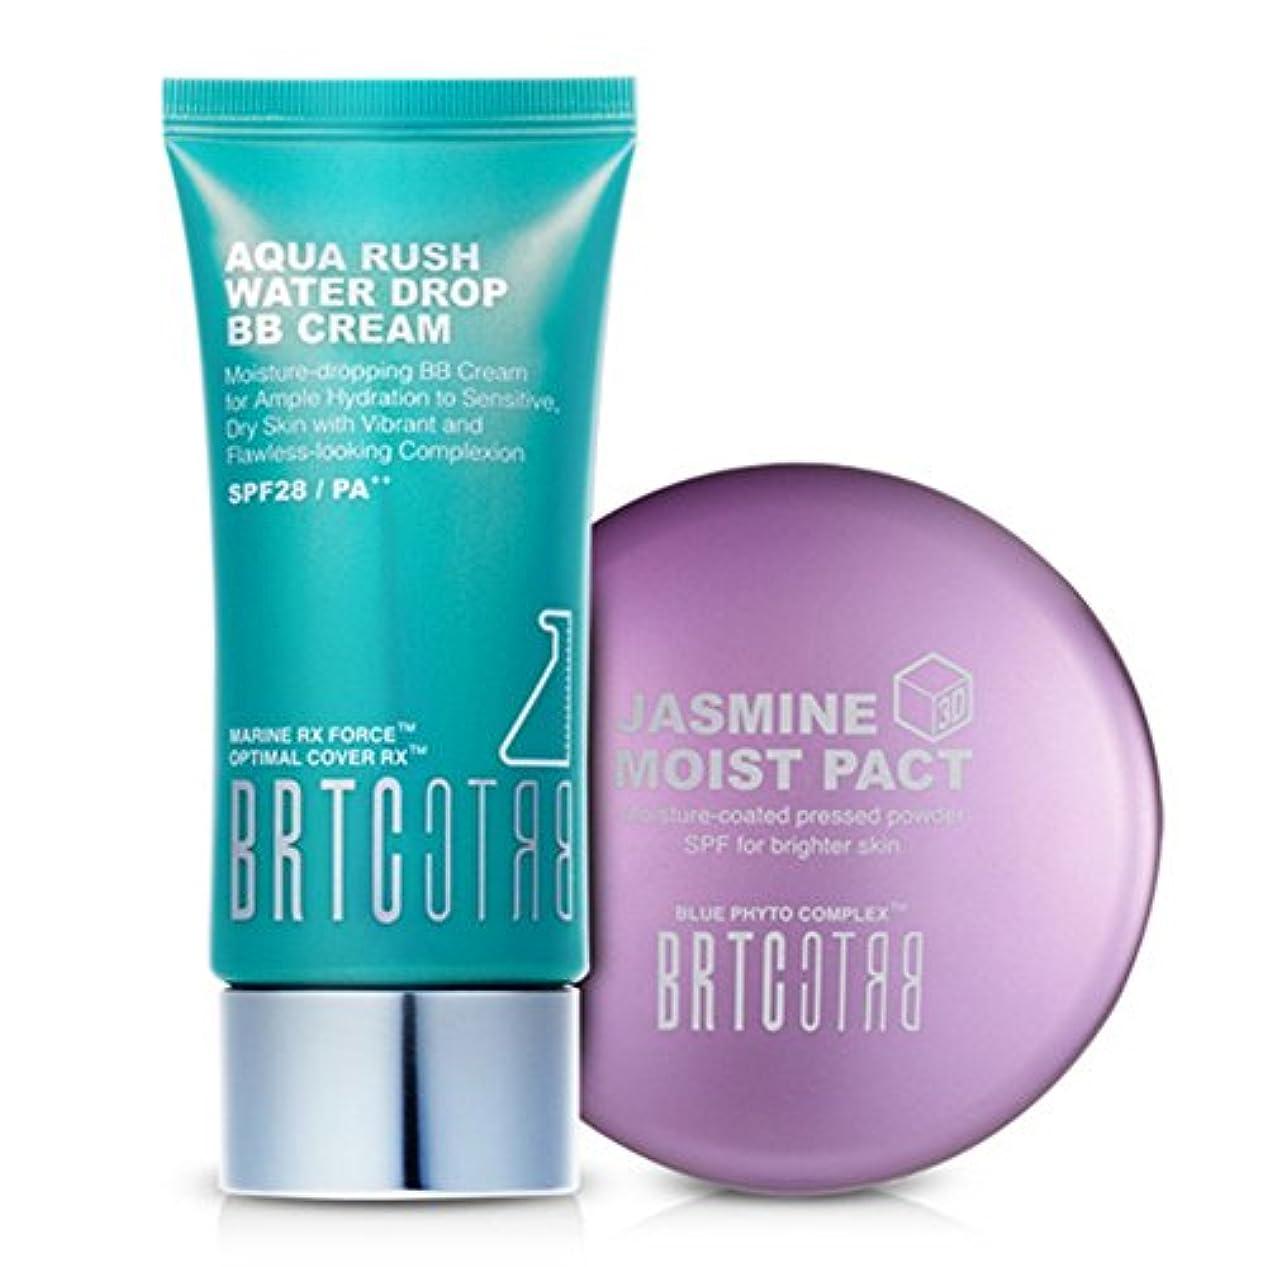 【BRTC/非アルティ時】Whitening&Moisture Make Up Set アクアラッシュビビ ファクト2種set [BB Cream+ Moist Pact Set](海外直送品)